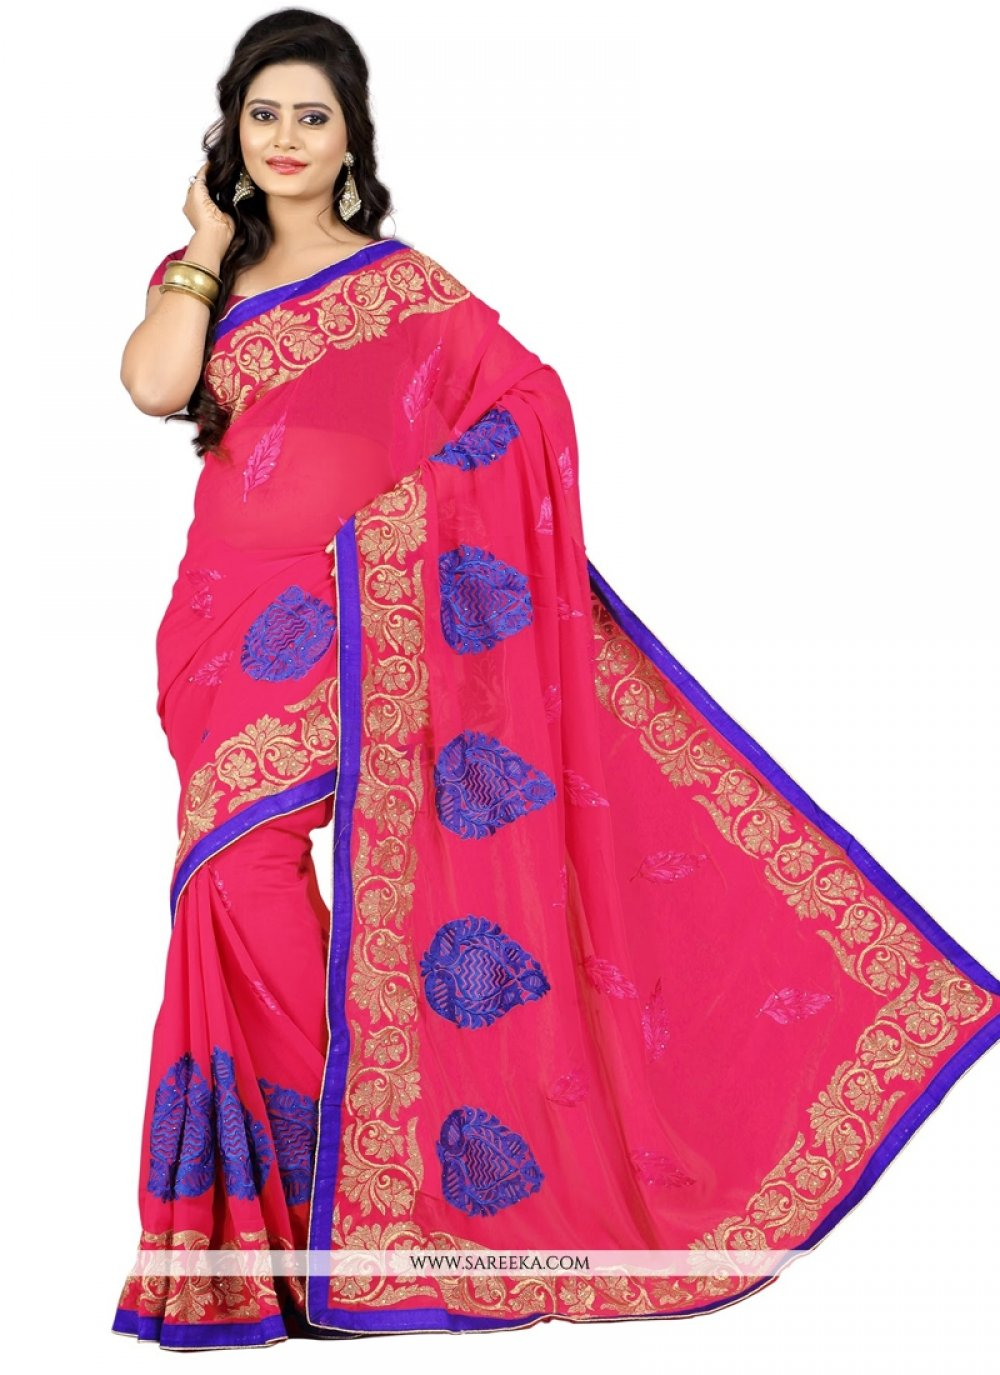 Embroidered Work Hot Pink Fancy Fabric Designer Saree